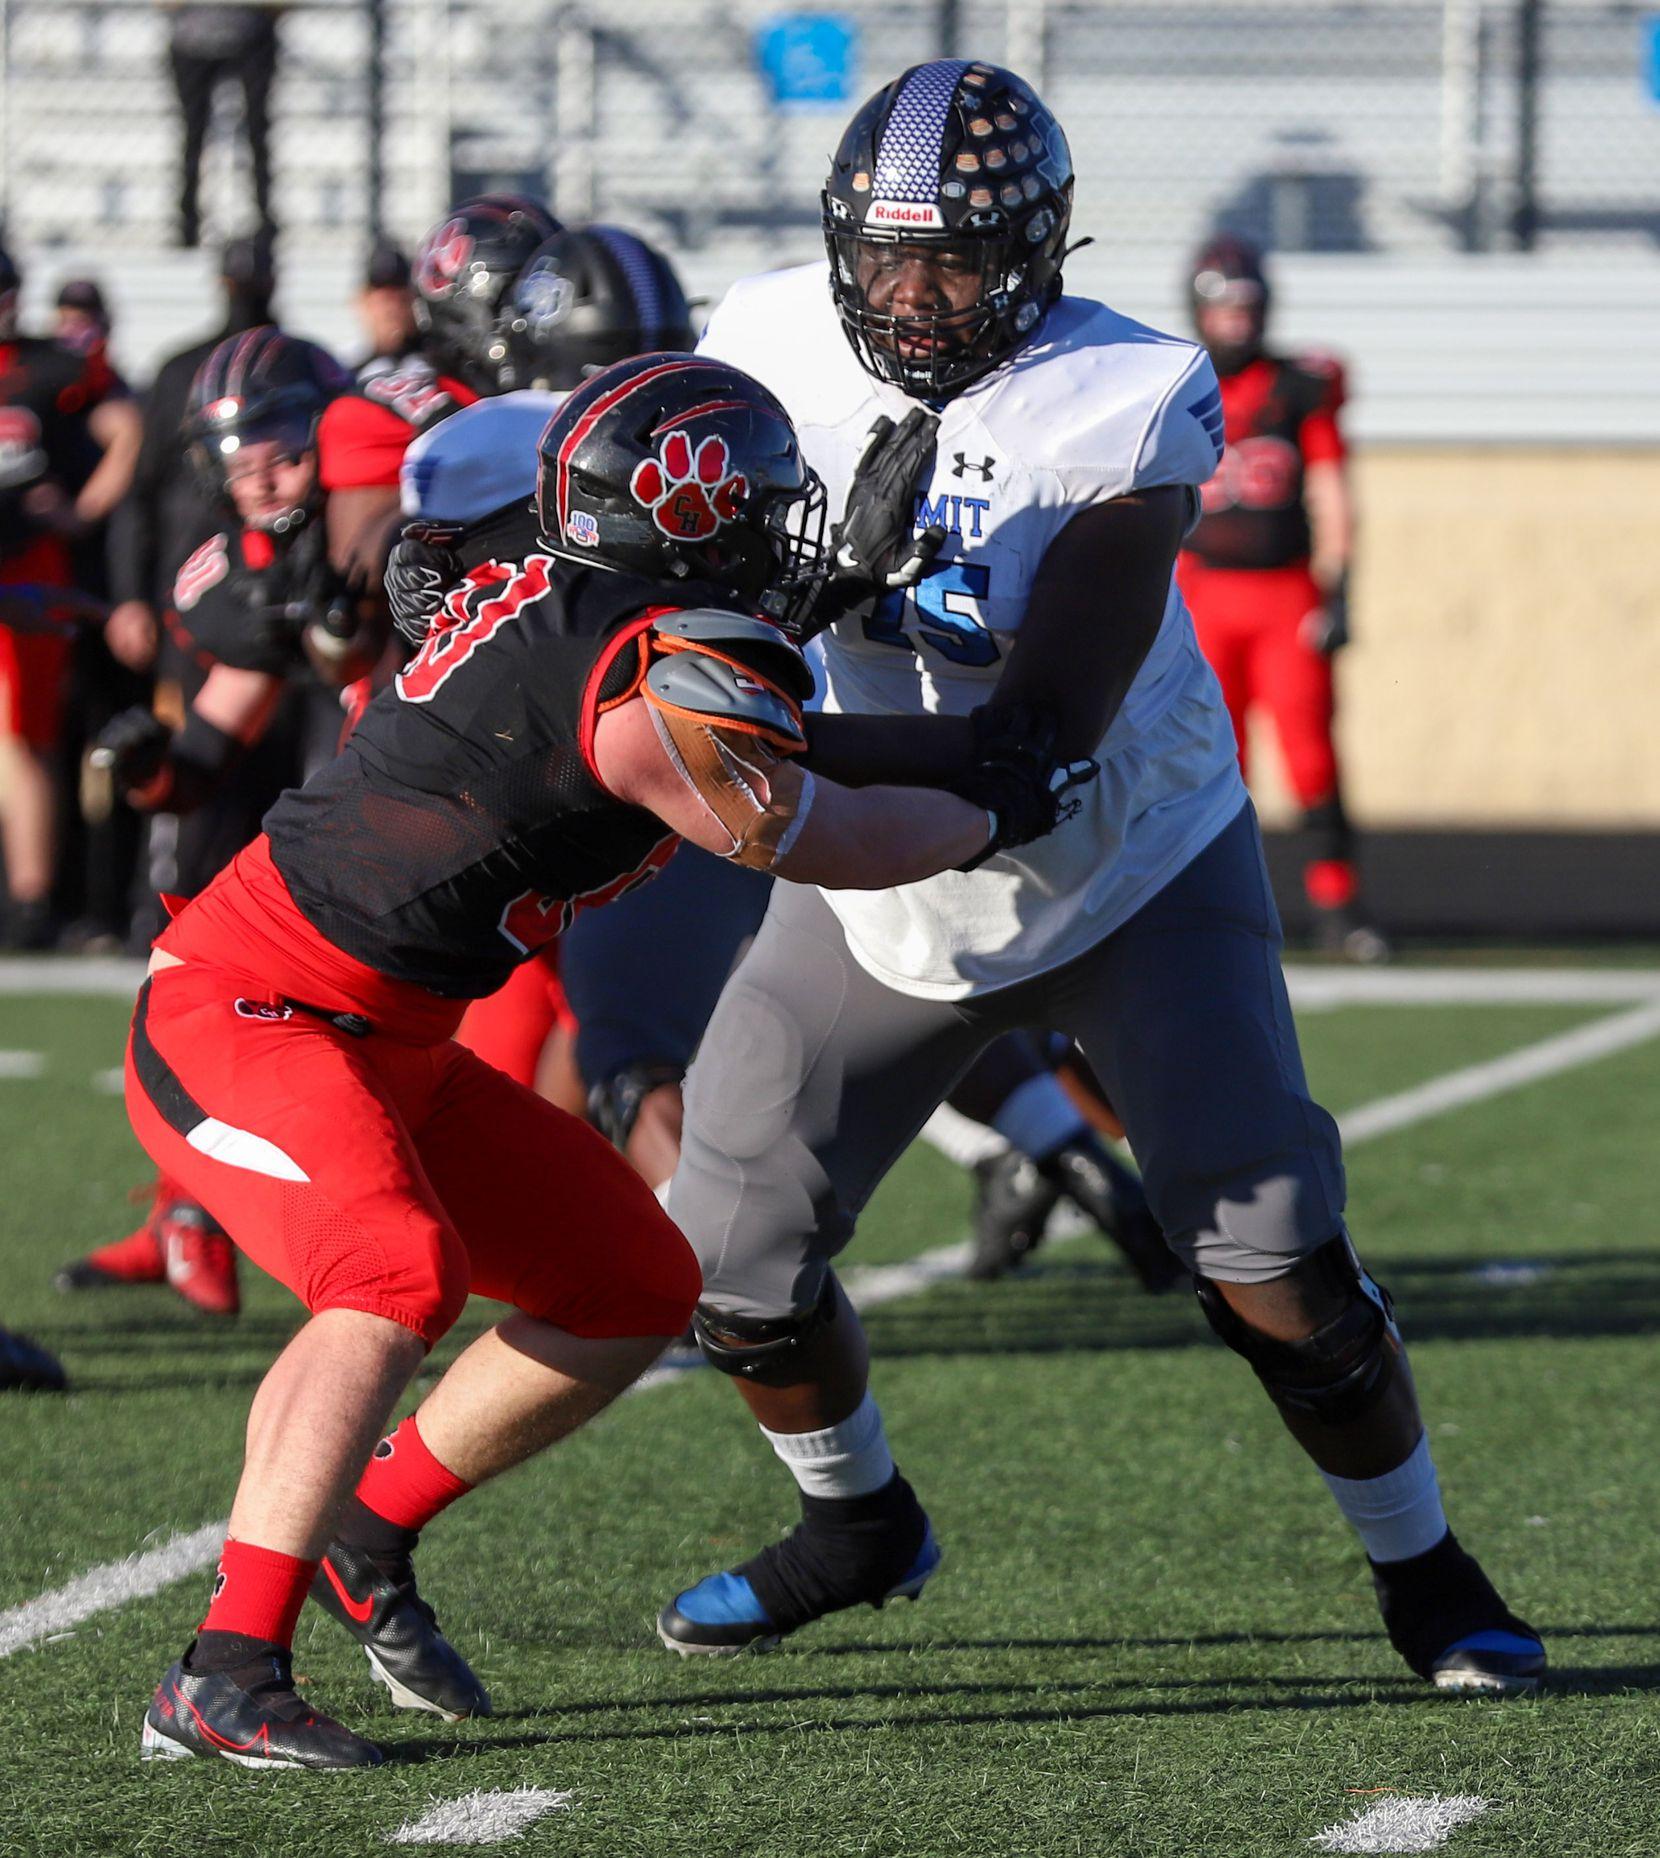 Mansfield Summit offensive lineman Colby Jackson (75) blocks Colleyville Heritage defensive lineman Taylor Steele (90) during the first half at Bearcat Stadium in Aledo, Texas, Saturday, December 26, 2020. (Elias Valverde II / Special Contributor)